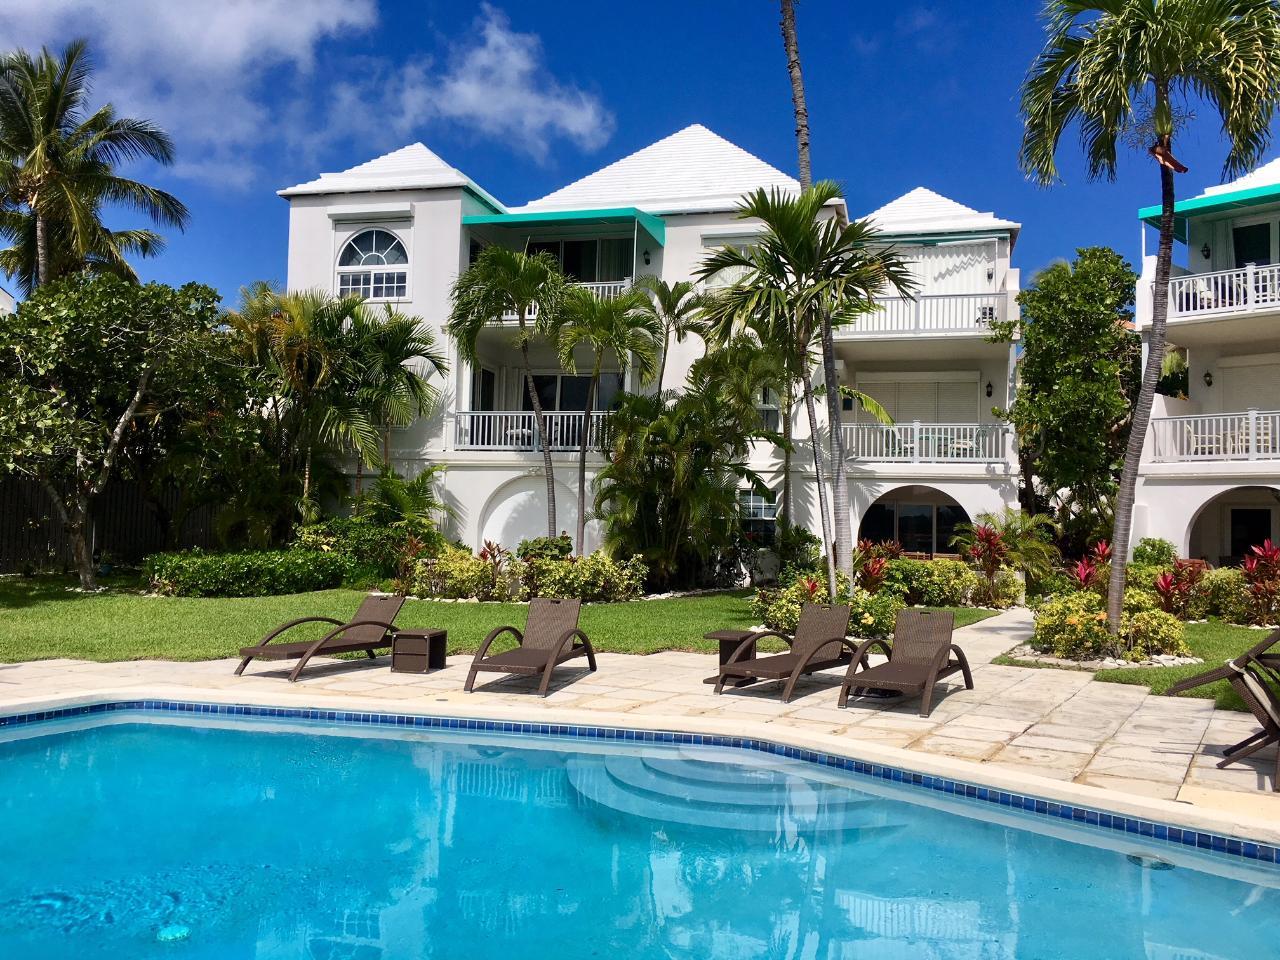 Condominium for Rent at Harbourside 11, Cloister Drive Paradise Island, Nassau And Paradise Island Bahamas